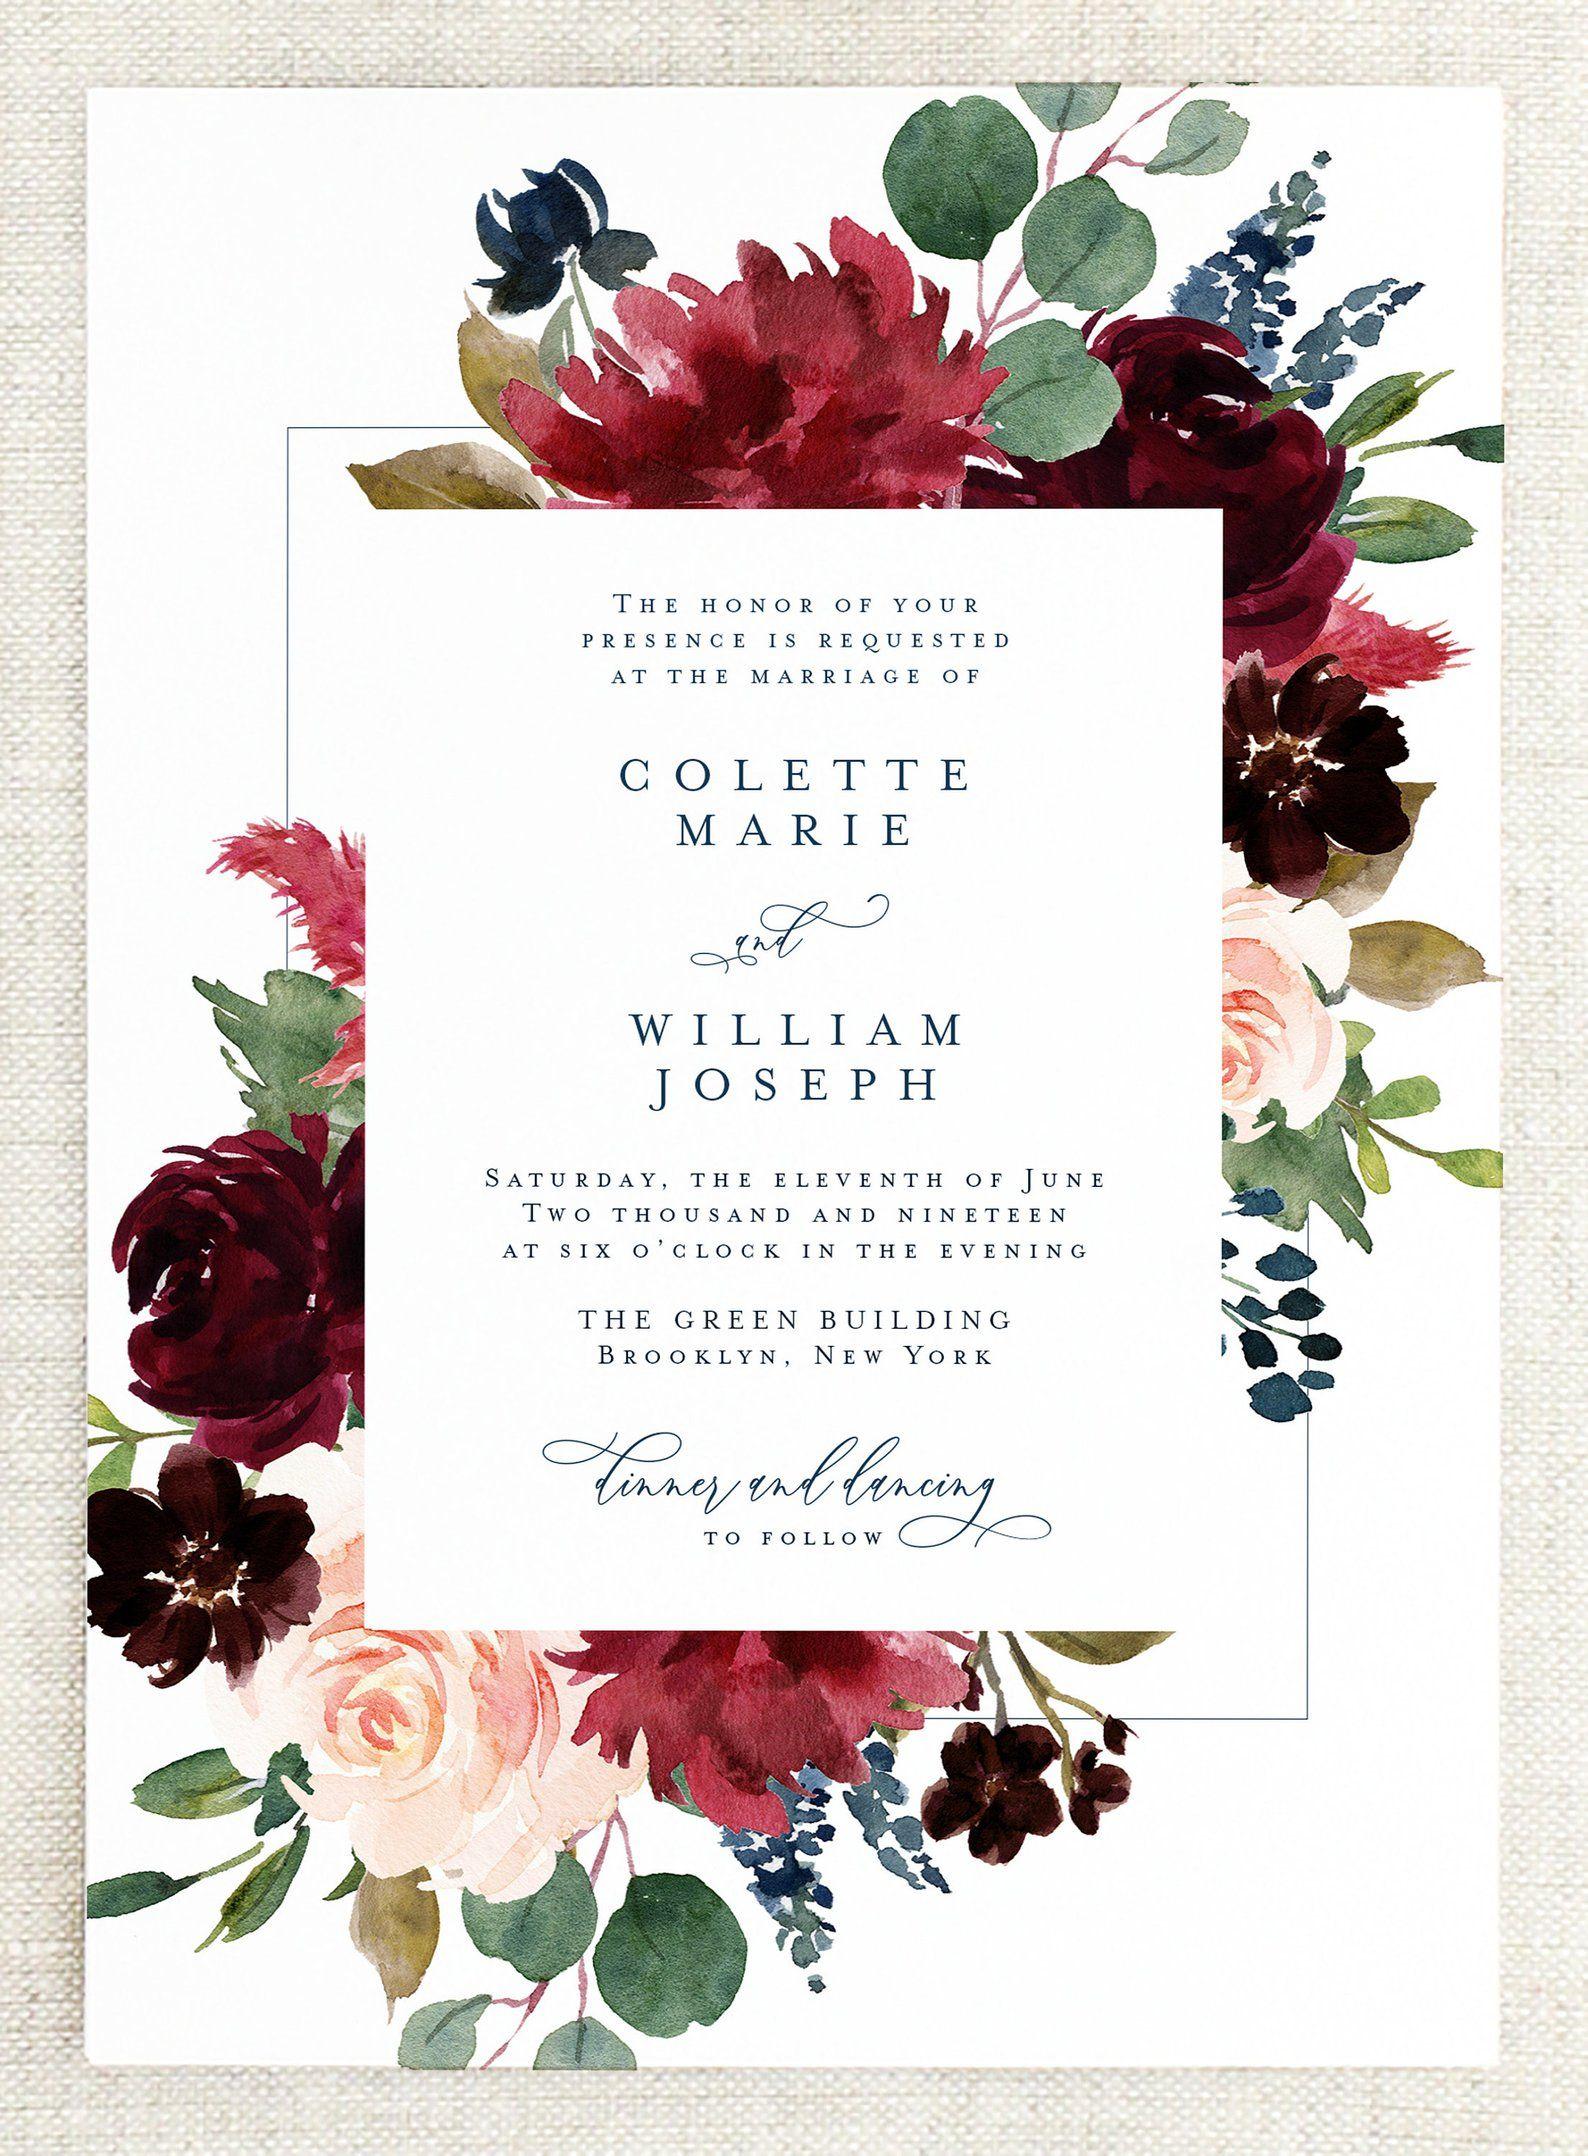 Printed Floral Wedding Invitation Set Fall Wedding Invites Etsy Floral Wedding Invitations Fall Wedding Invitations Wedding Invitation Sets